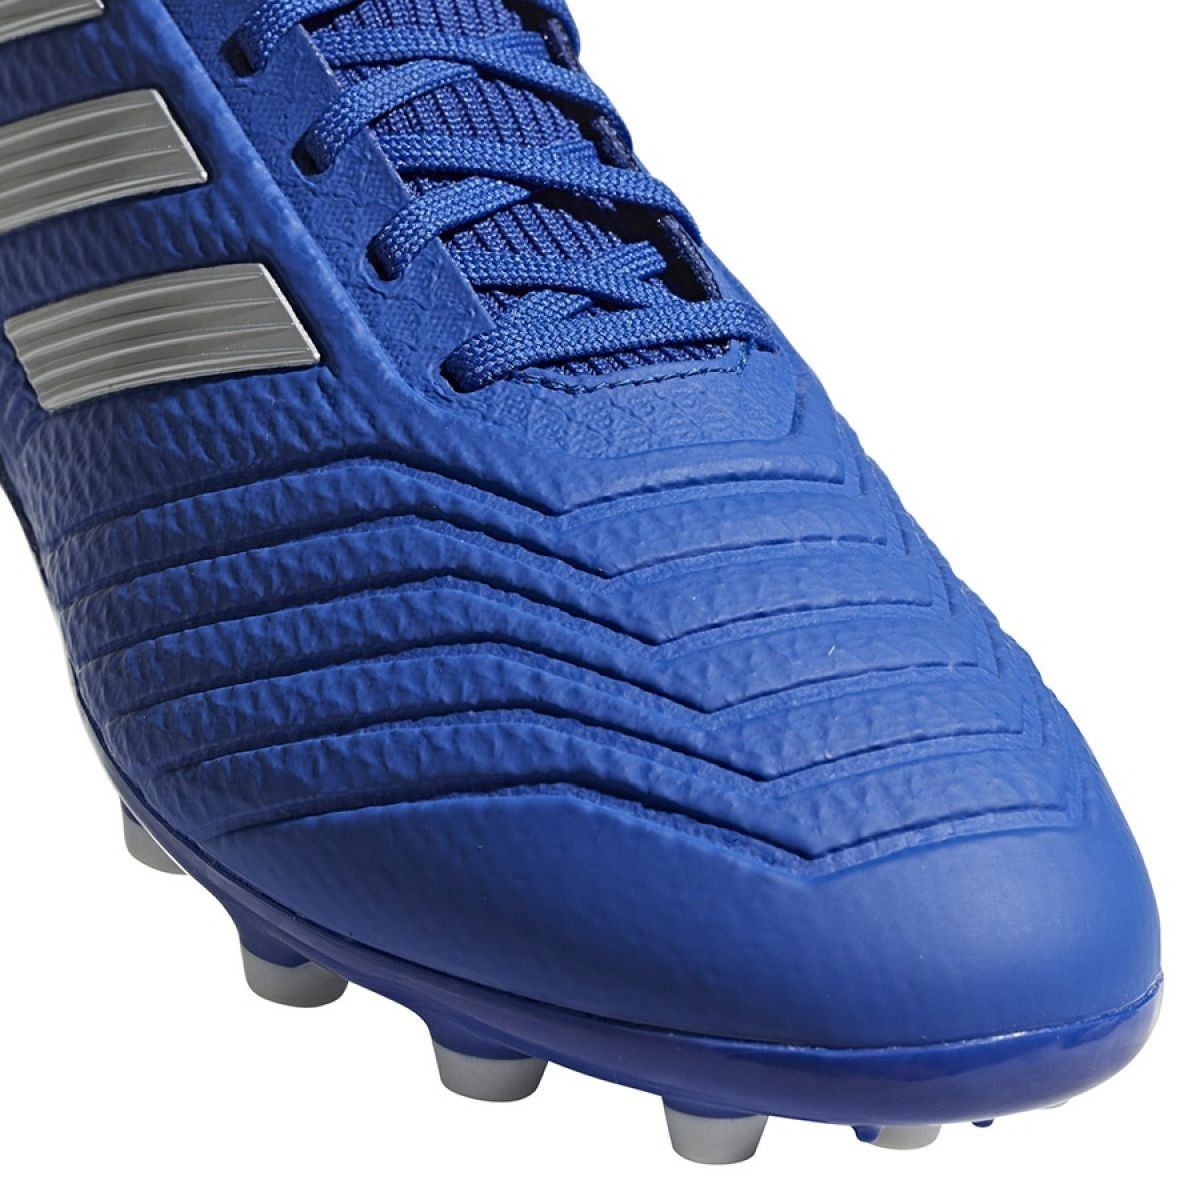 Buty piłkarskie adidas Predator 19.3 Ag M BC0297 niebieski